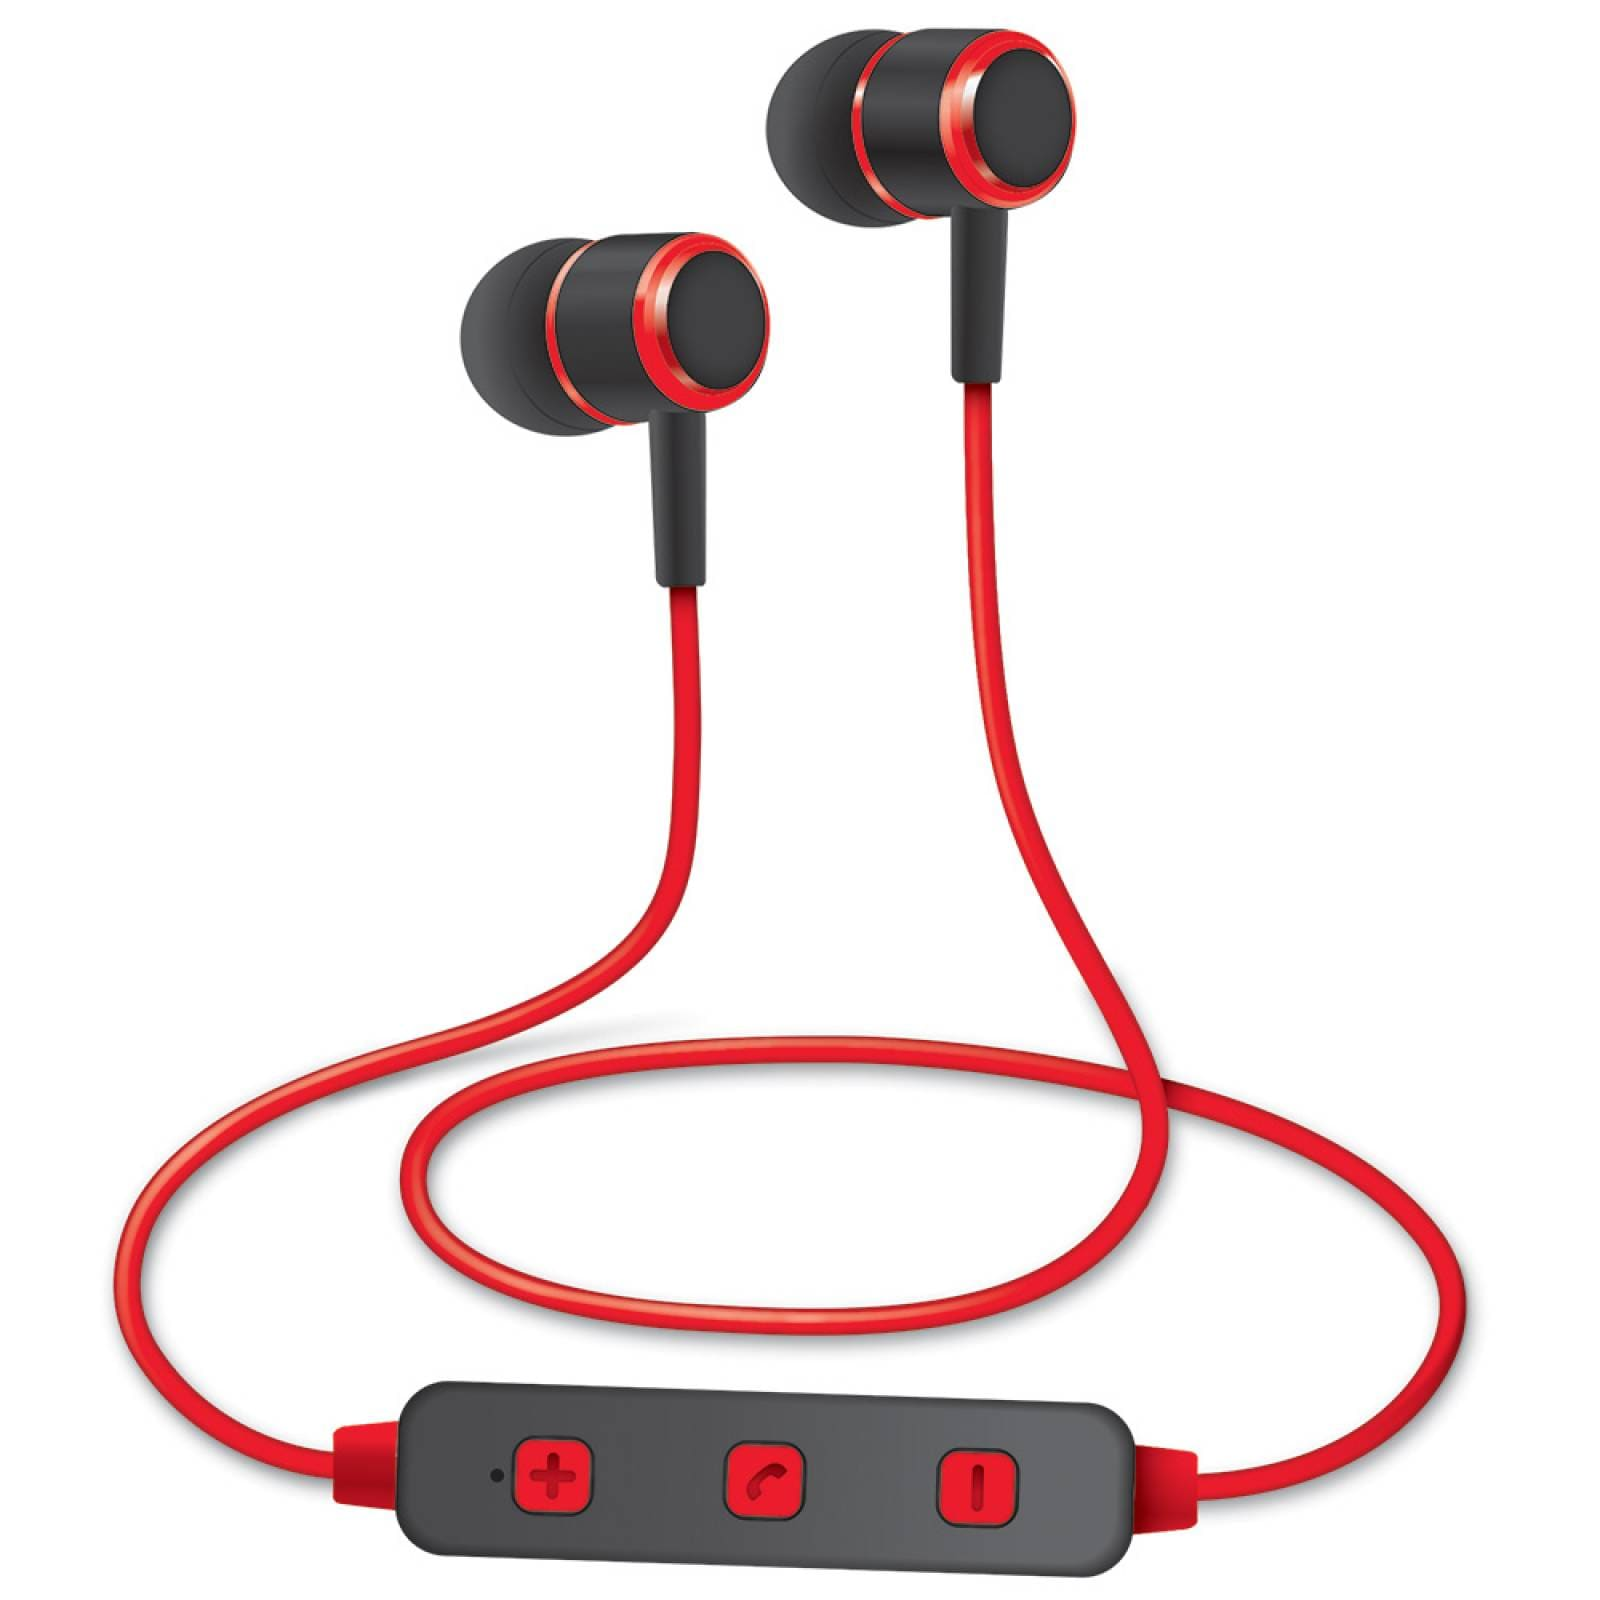 Audífonos Sport Bluetooth Recargable Manos Libres Pp-ebt10